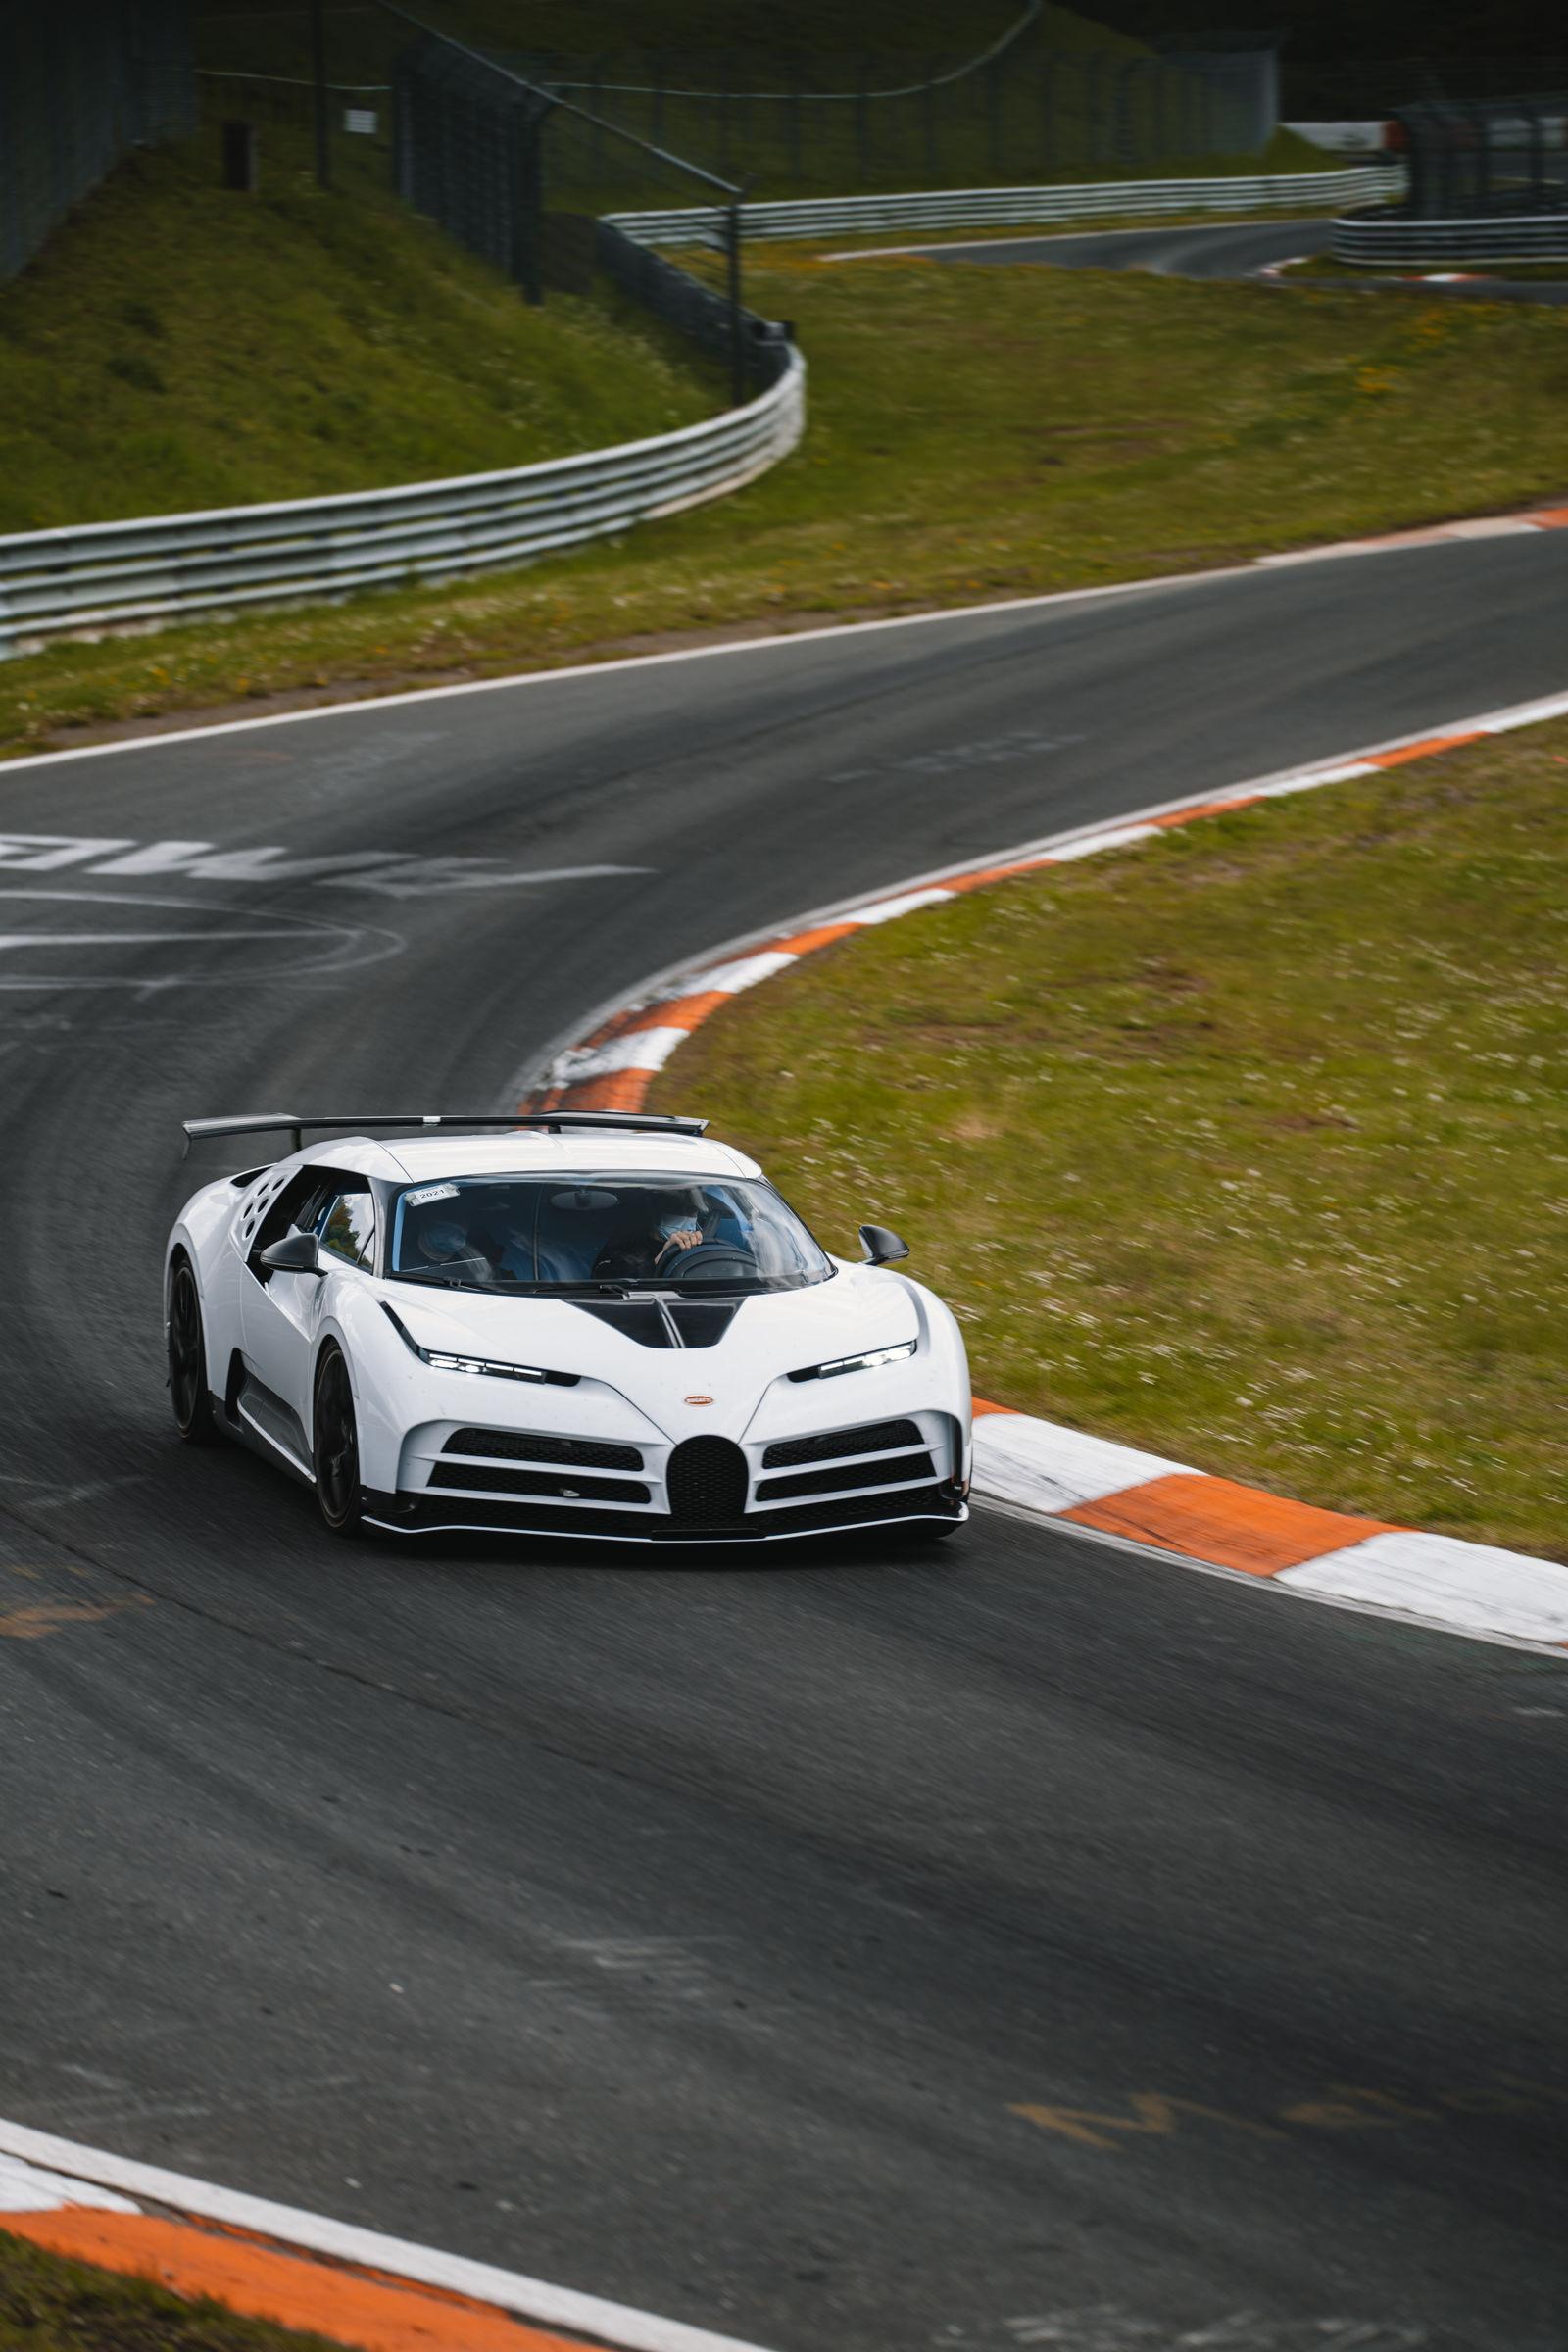 Bugatti Centodieci Nürburgring